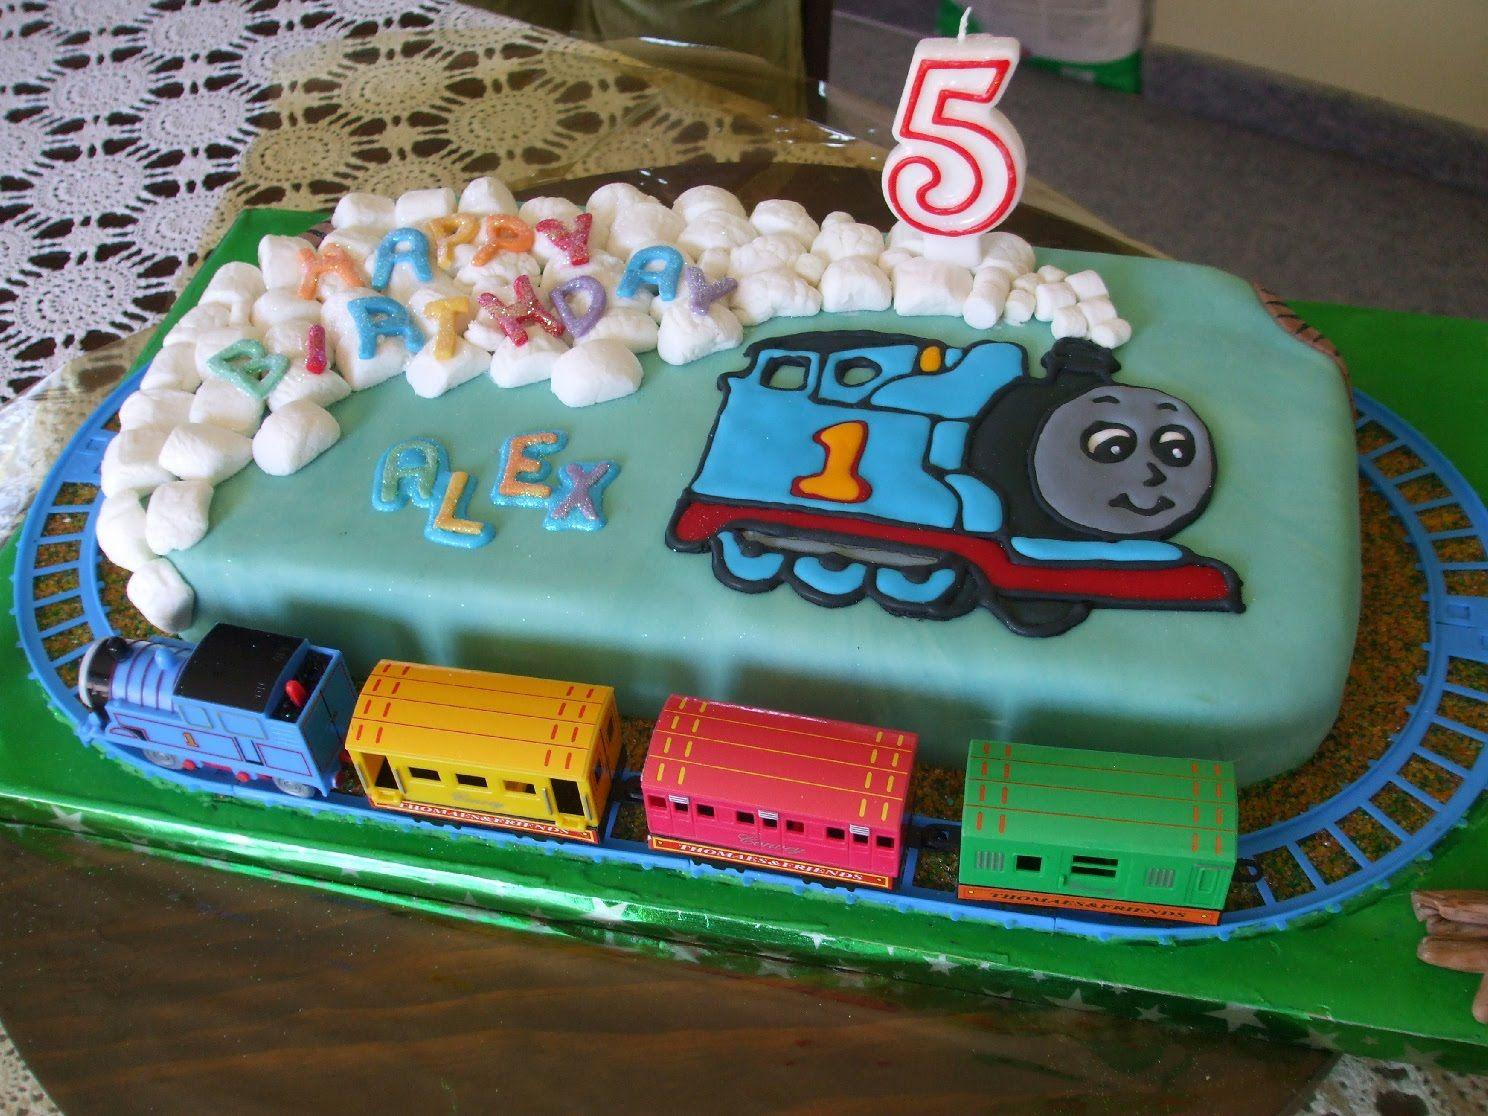 Thomas The Train Birthday Cakes Another Thomas The Tank Engine - Thomas birthday cake images